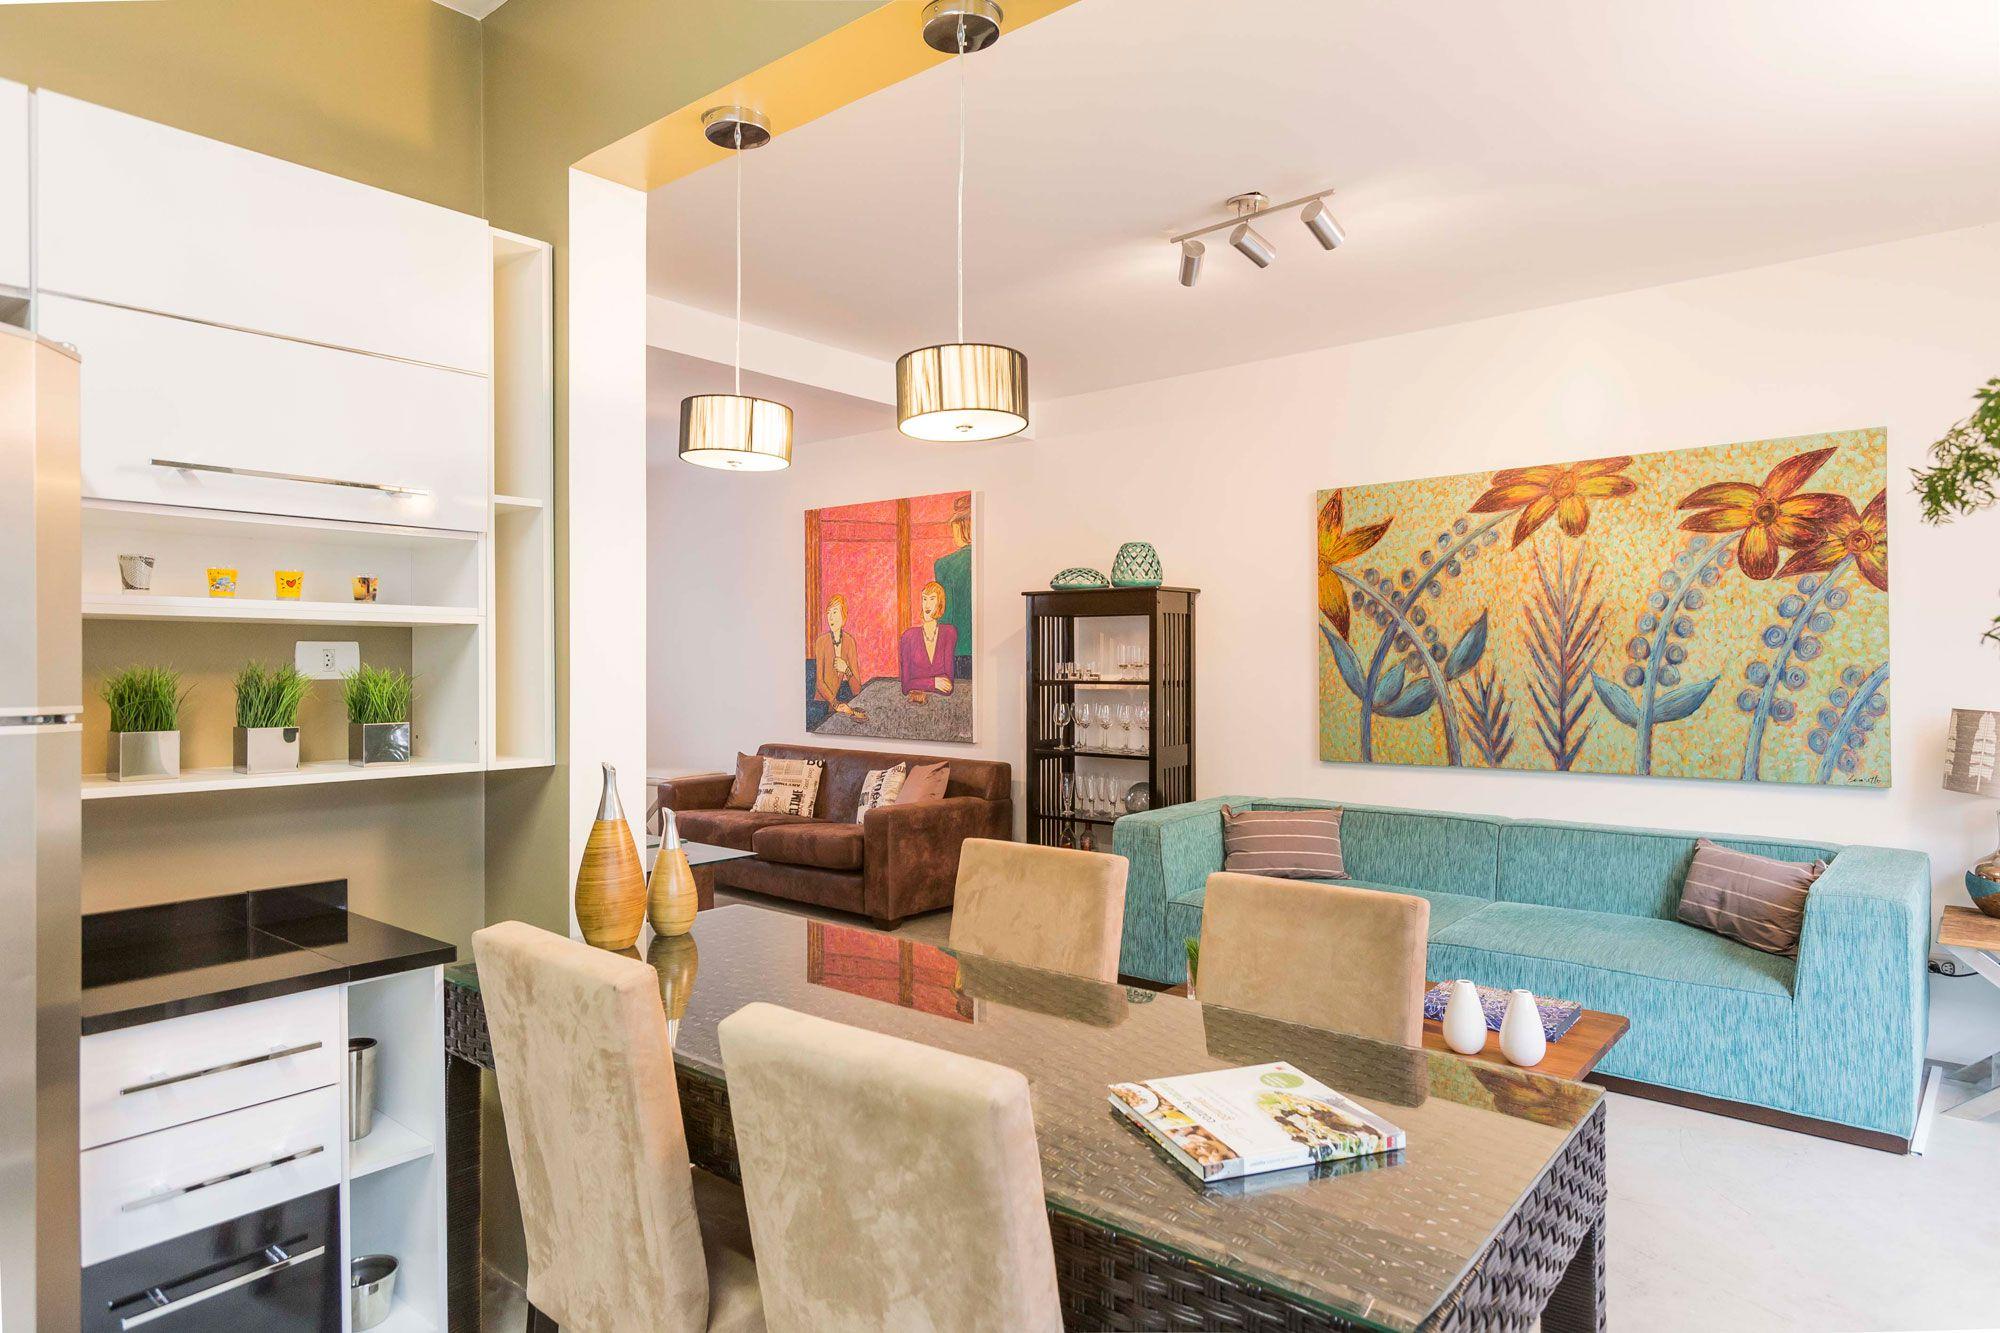 Granja-Julieta-Residence-24